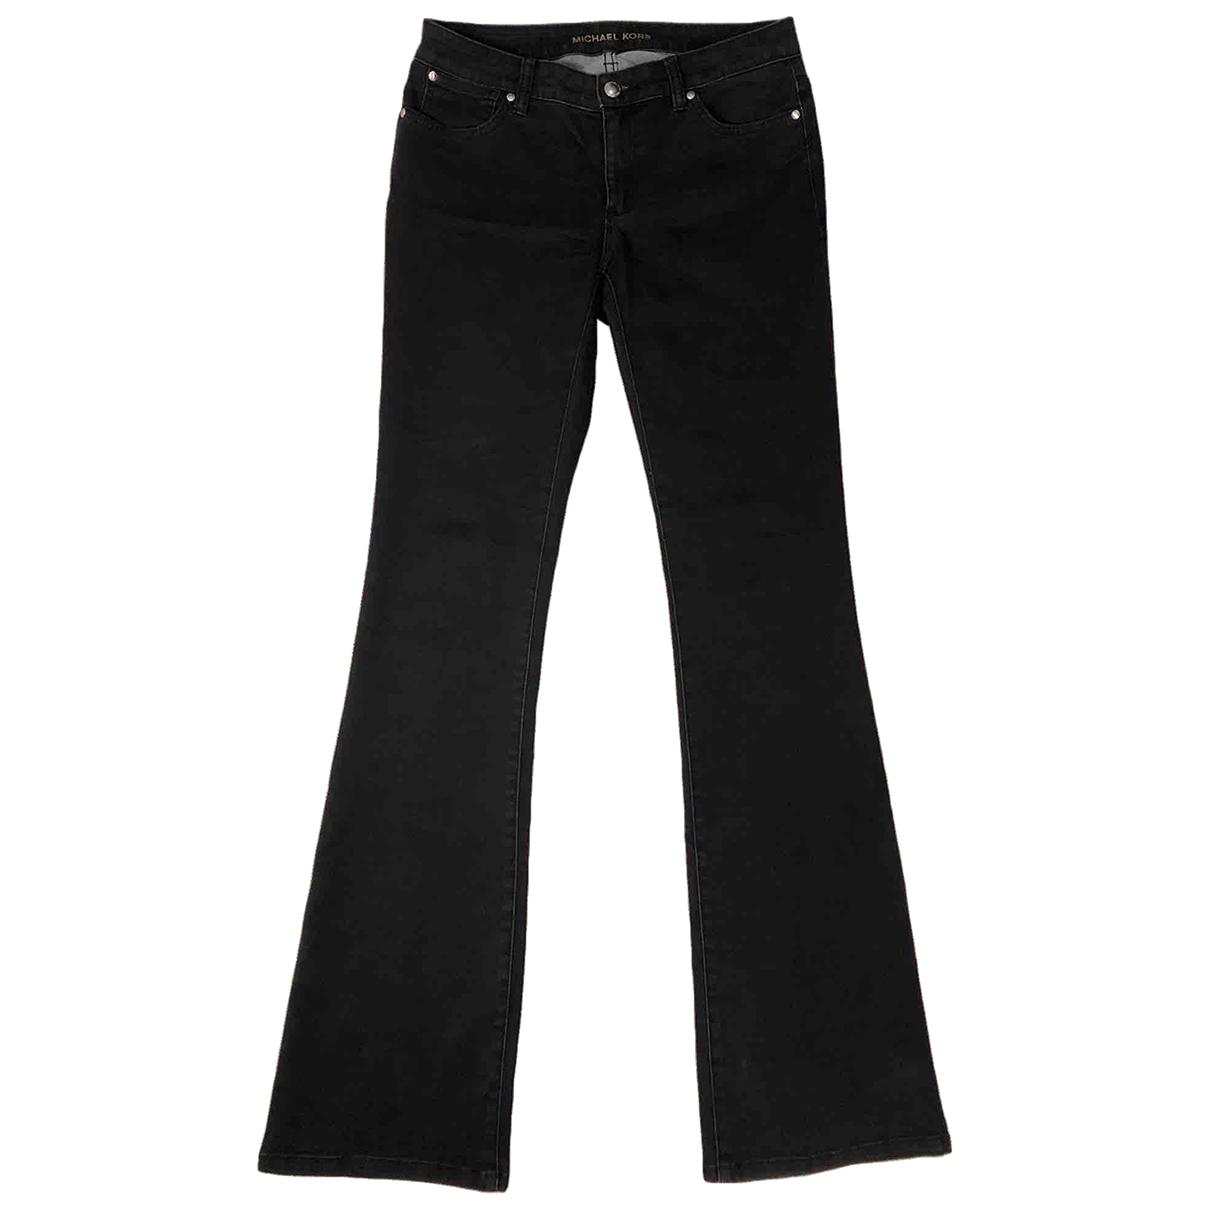 Michael Kors \N Black Cotton Jeans for Women 27 US